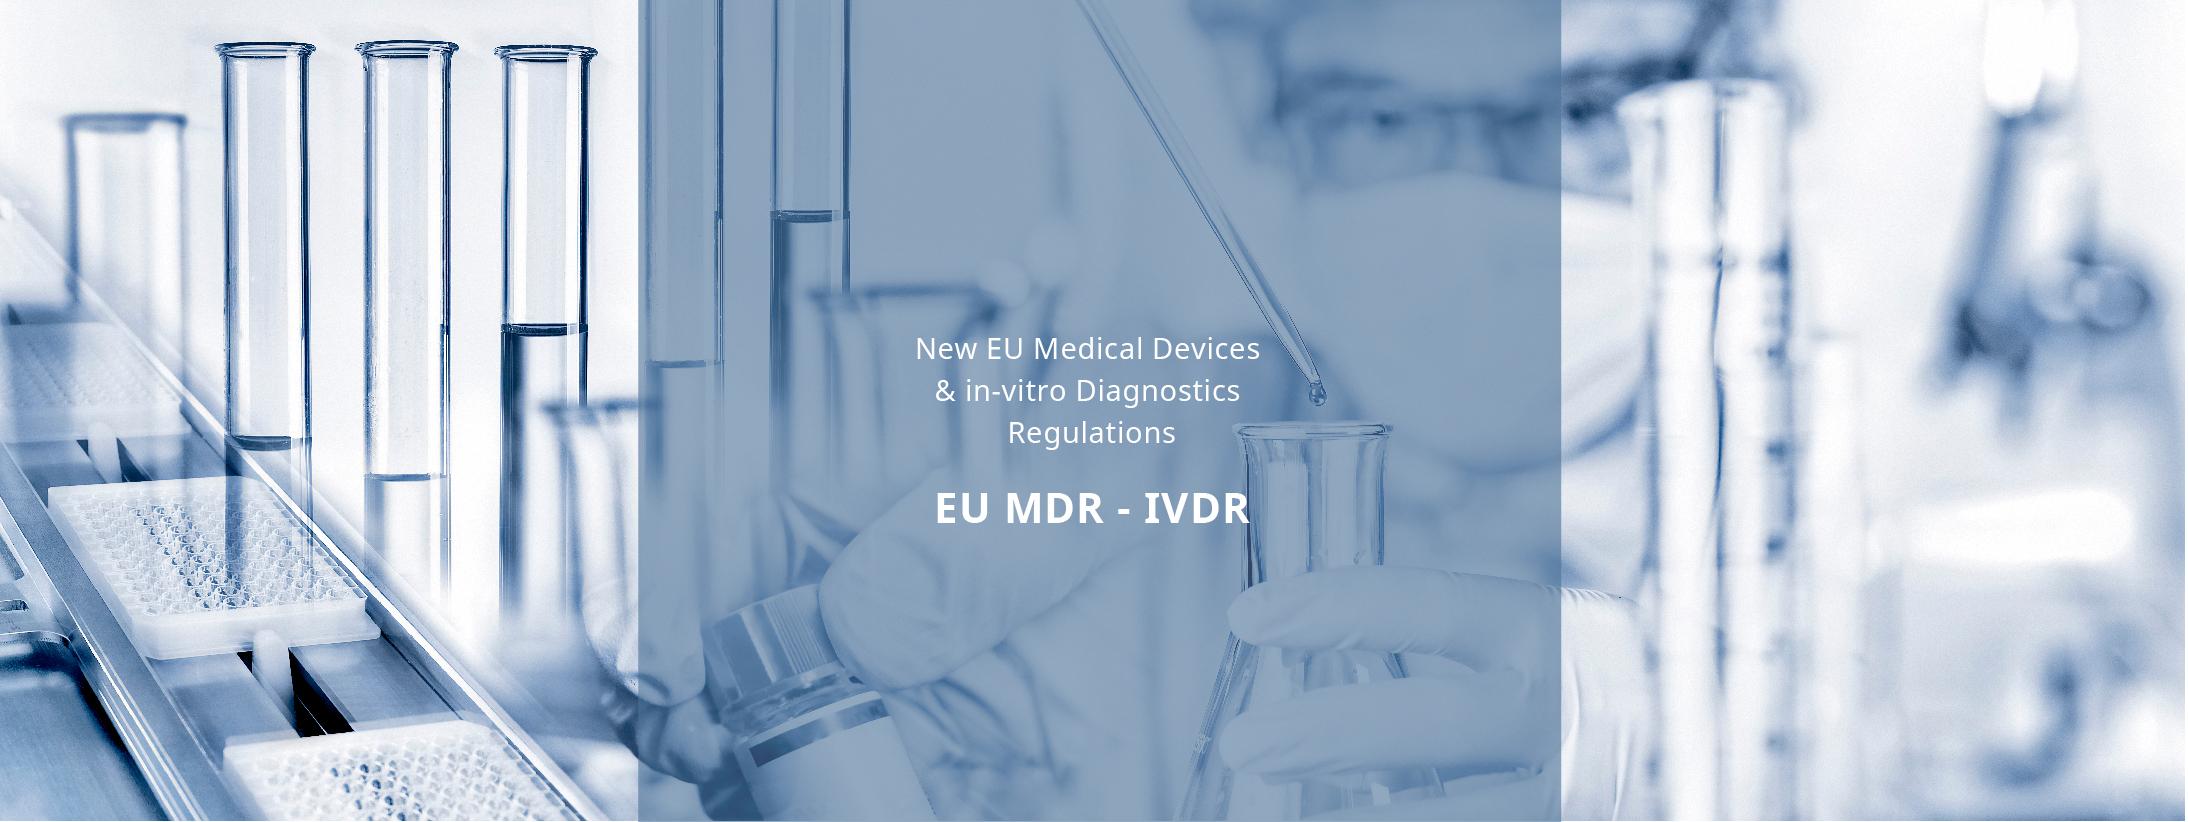 MDR and IVDR